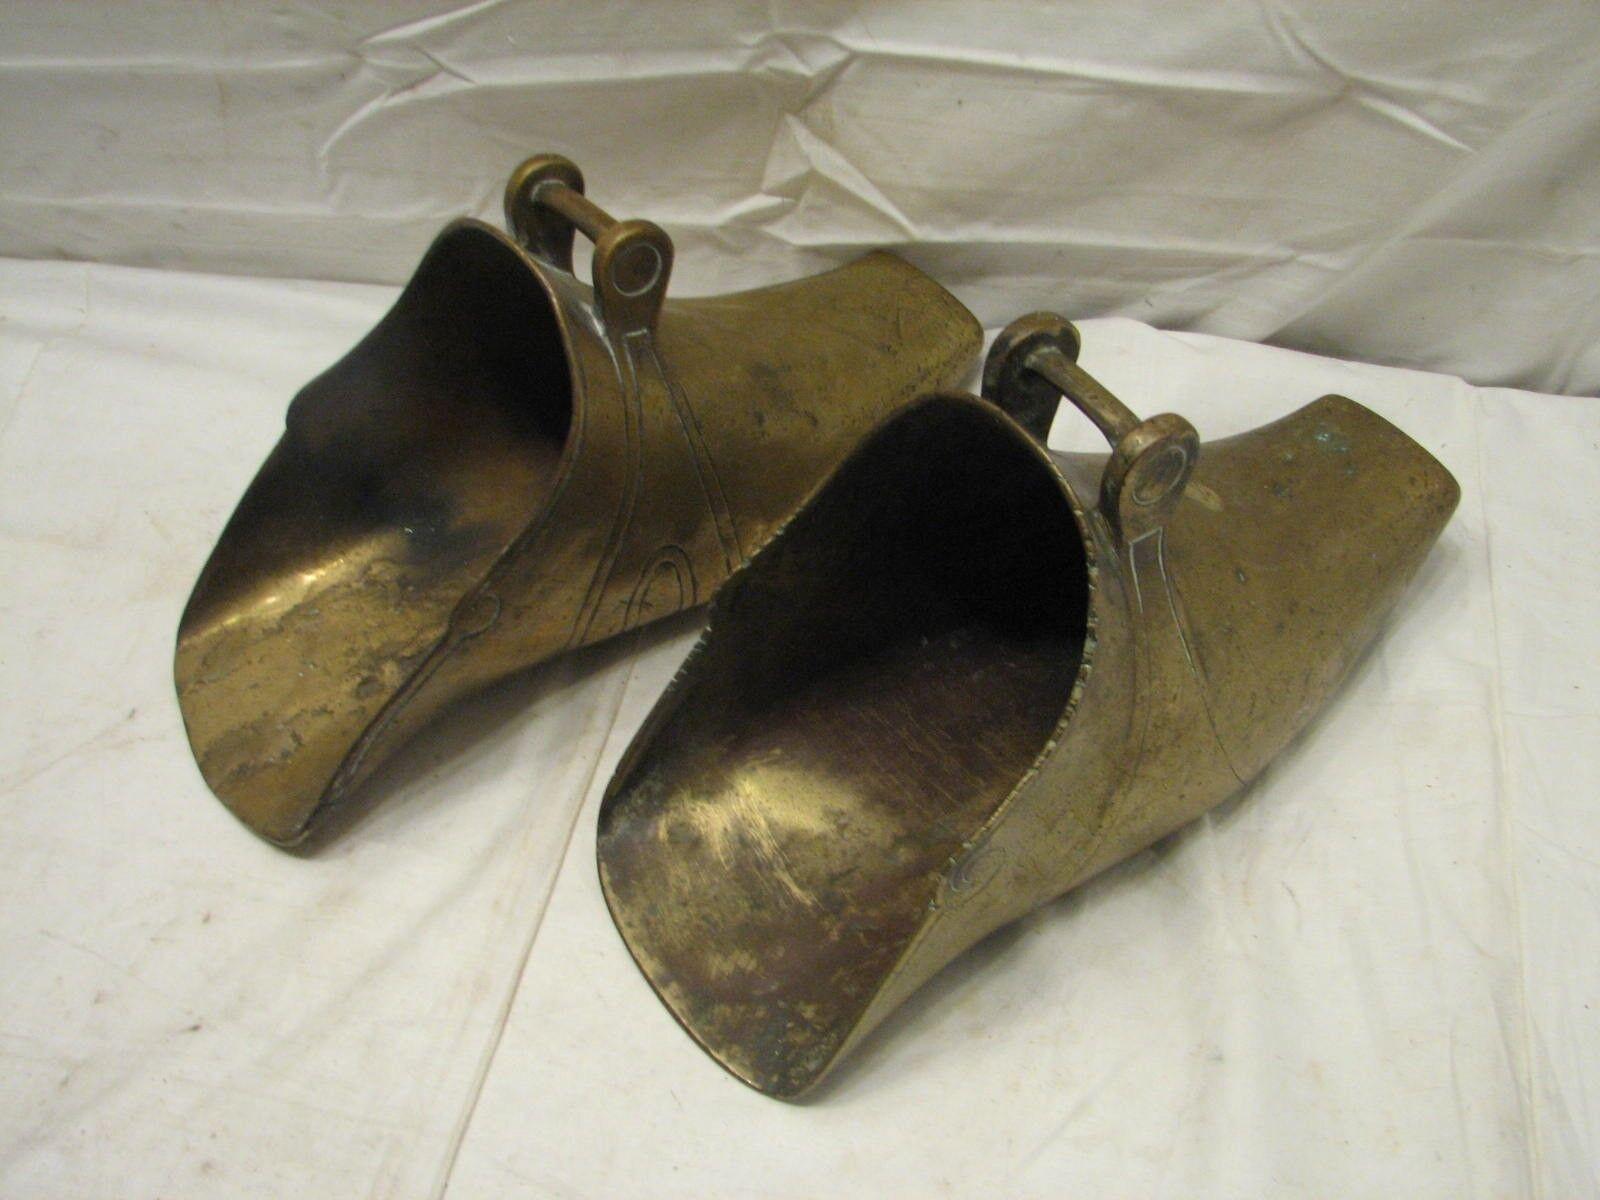 Pair  Brass Stirrups Vaquero Spanish Conquistador Horse Riding shoes Equestrian  fast delivery